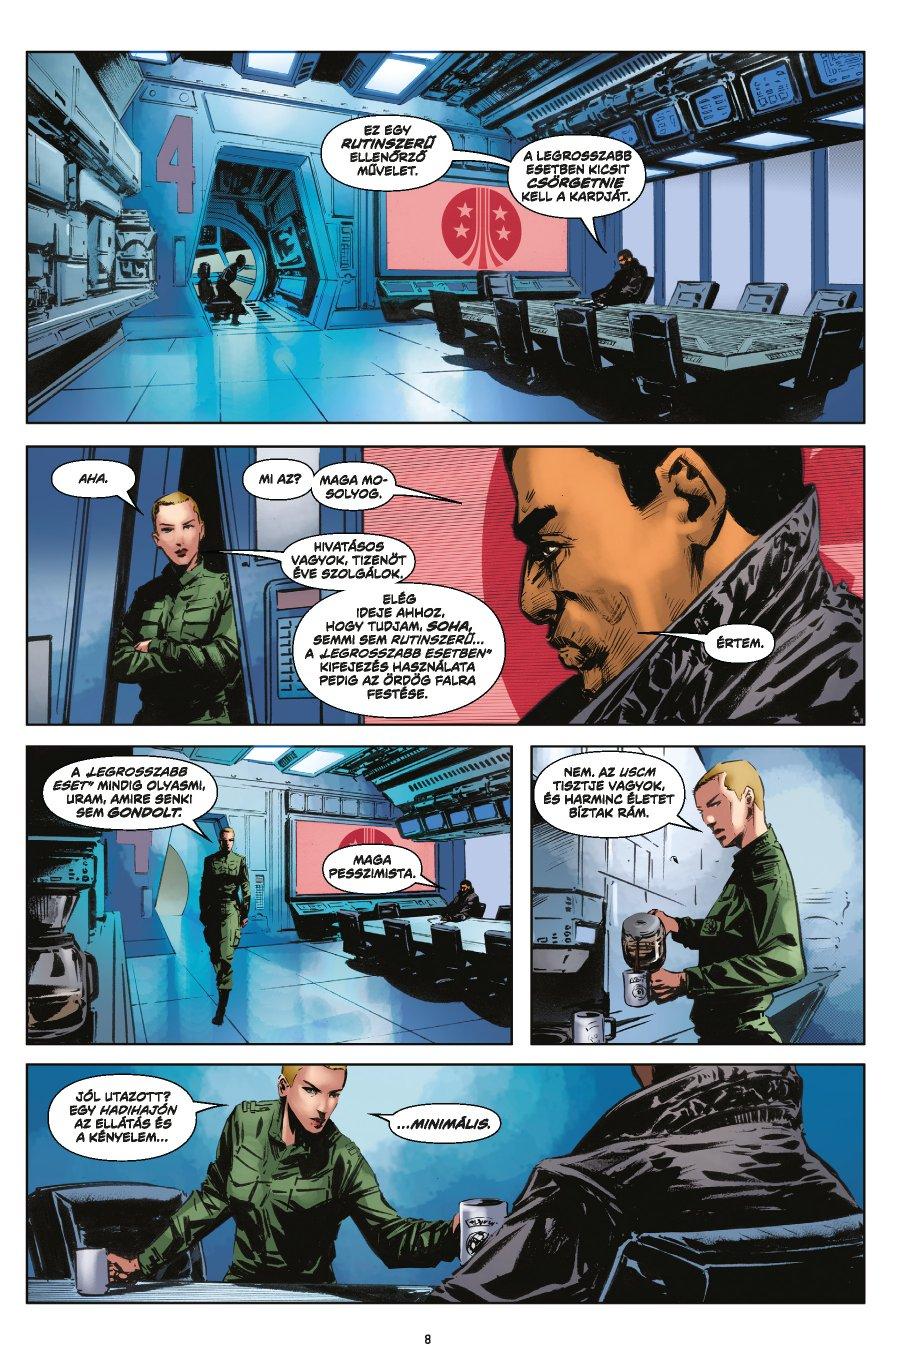 predator_comic_book_1_kep